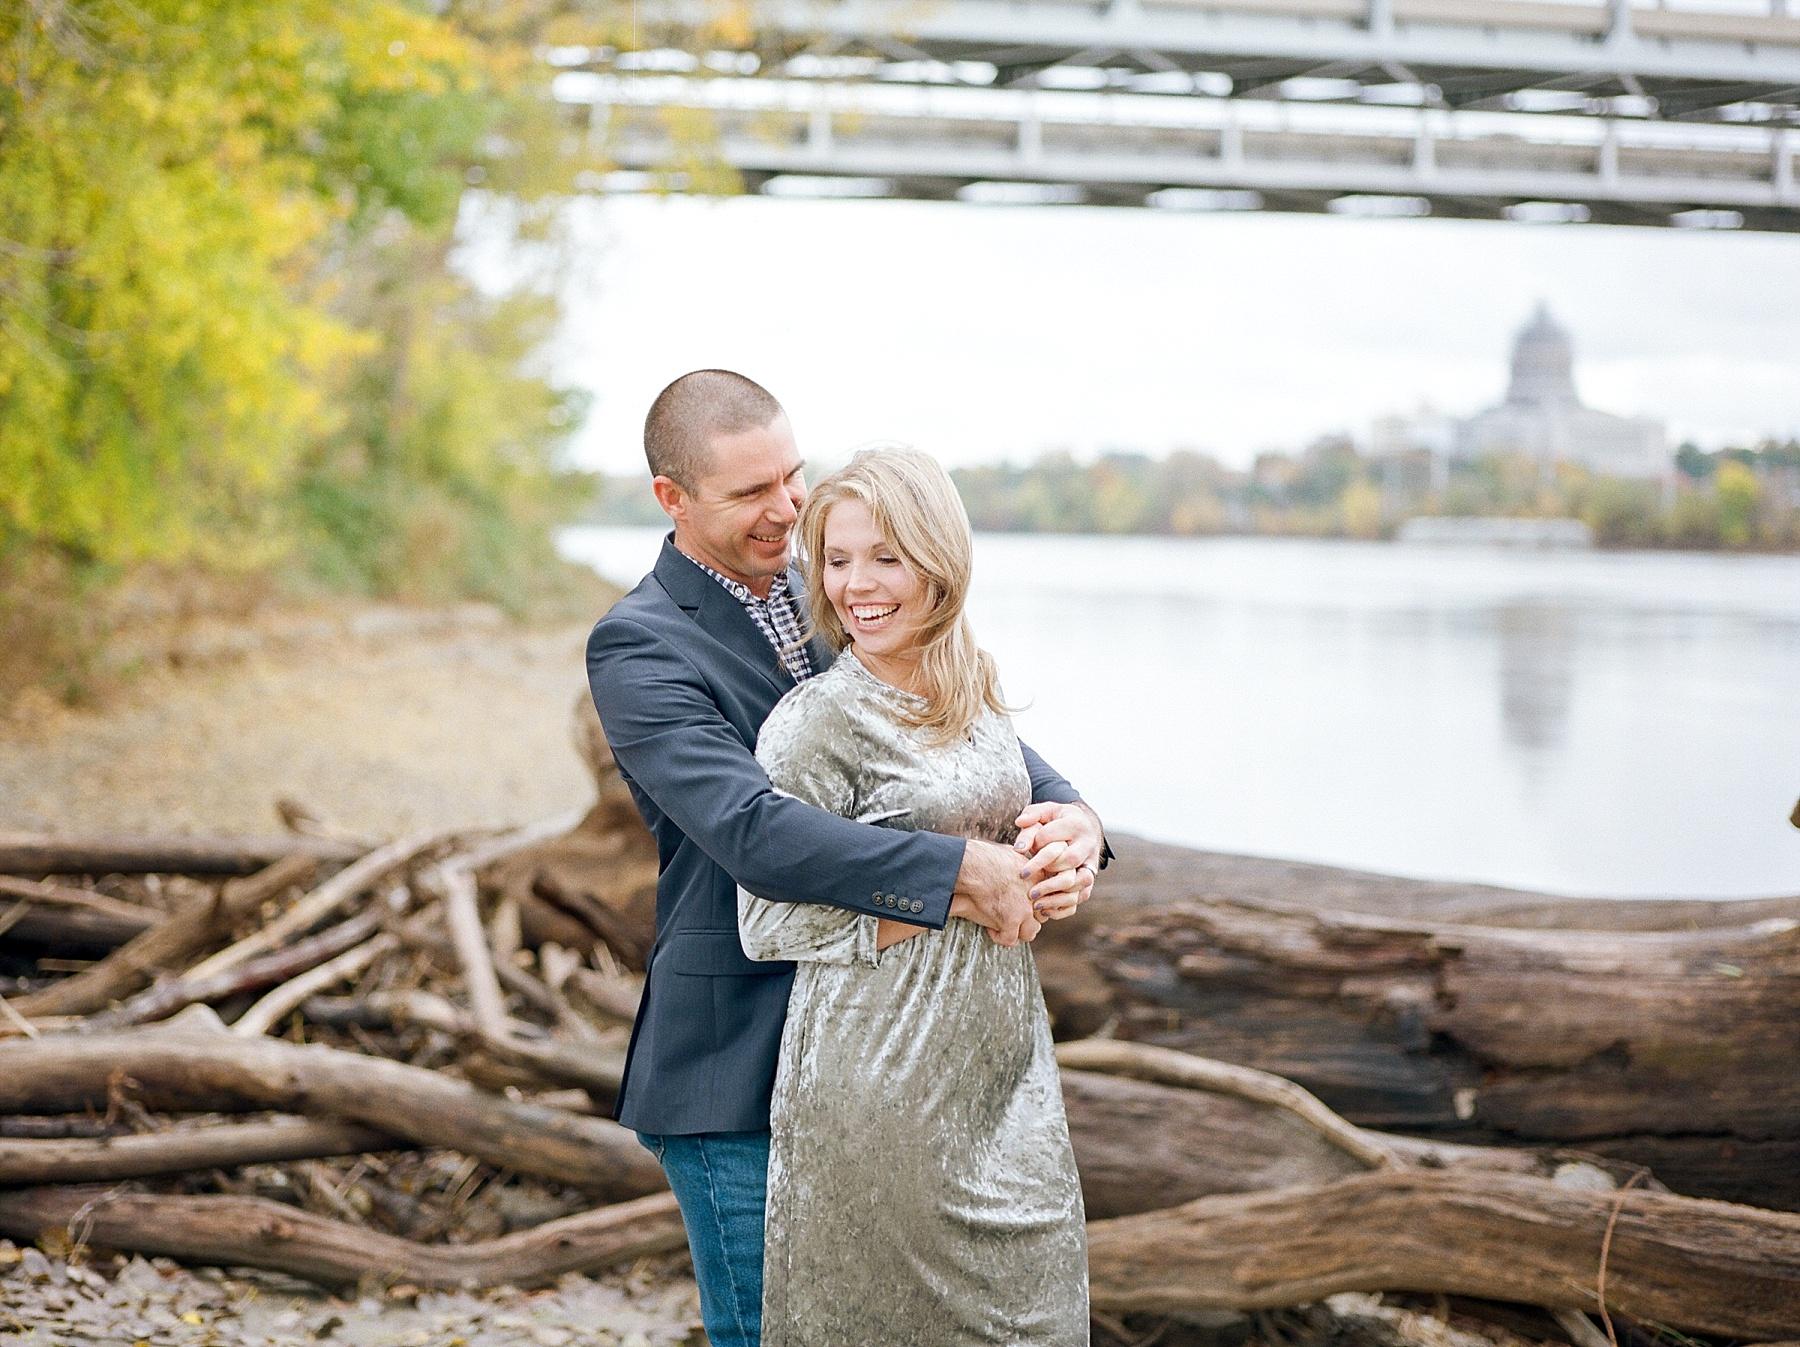 Ten Year Anniversary Session on Shore of Missouri River by Kelsi Kliethermes Photography Kansas City Missouri Wedding Photographer_0002.jpg